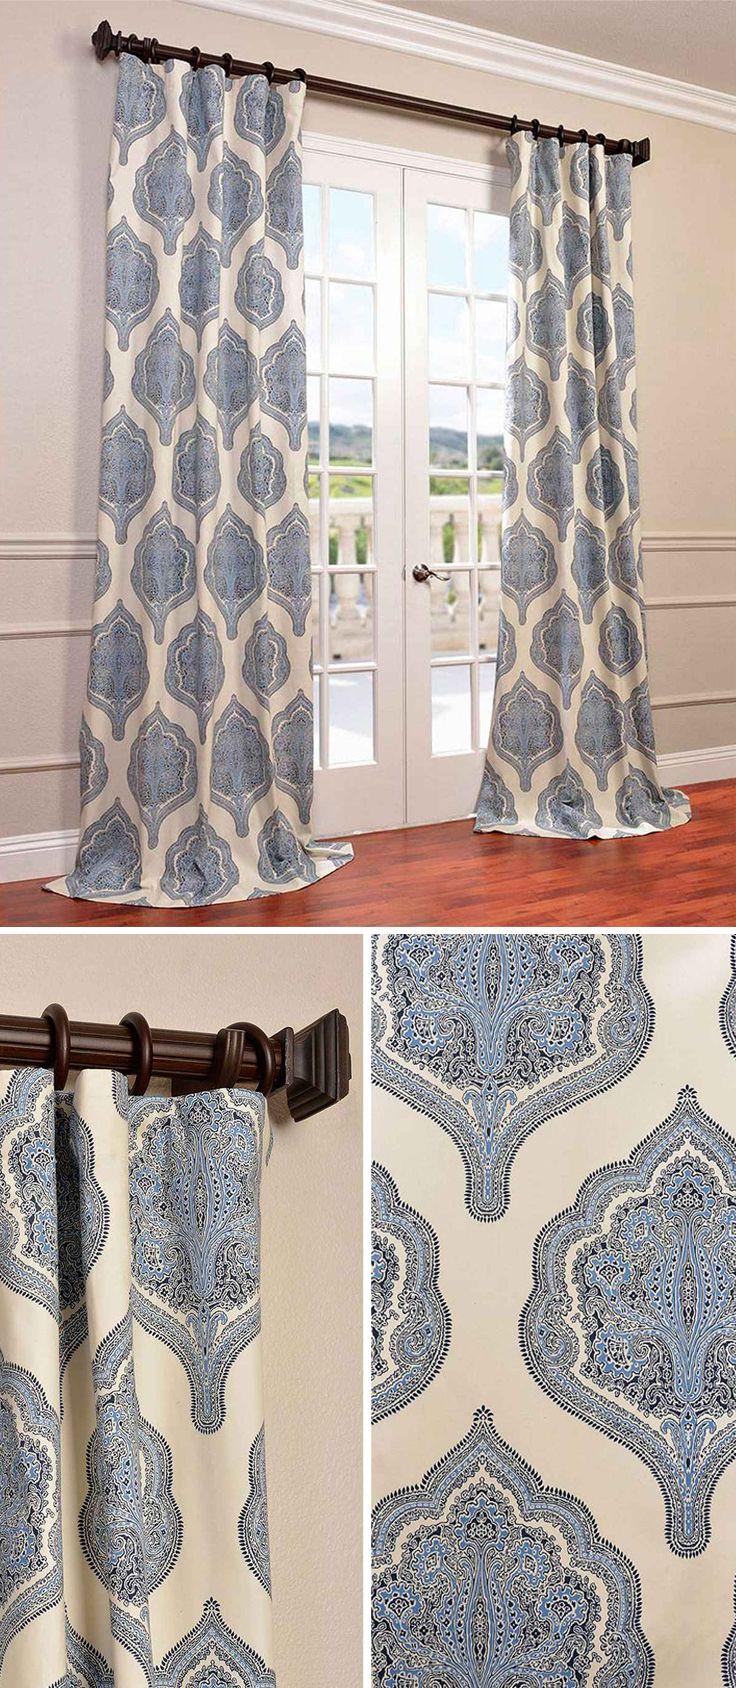 Half Price Drapes Arabesque Blue 96 X 50 Inch Curtain Single Panel Printed Cotton The Ojays